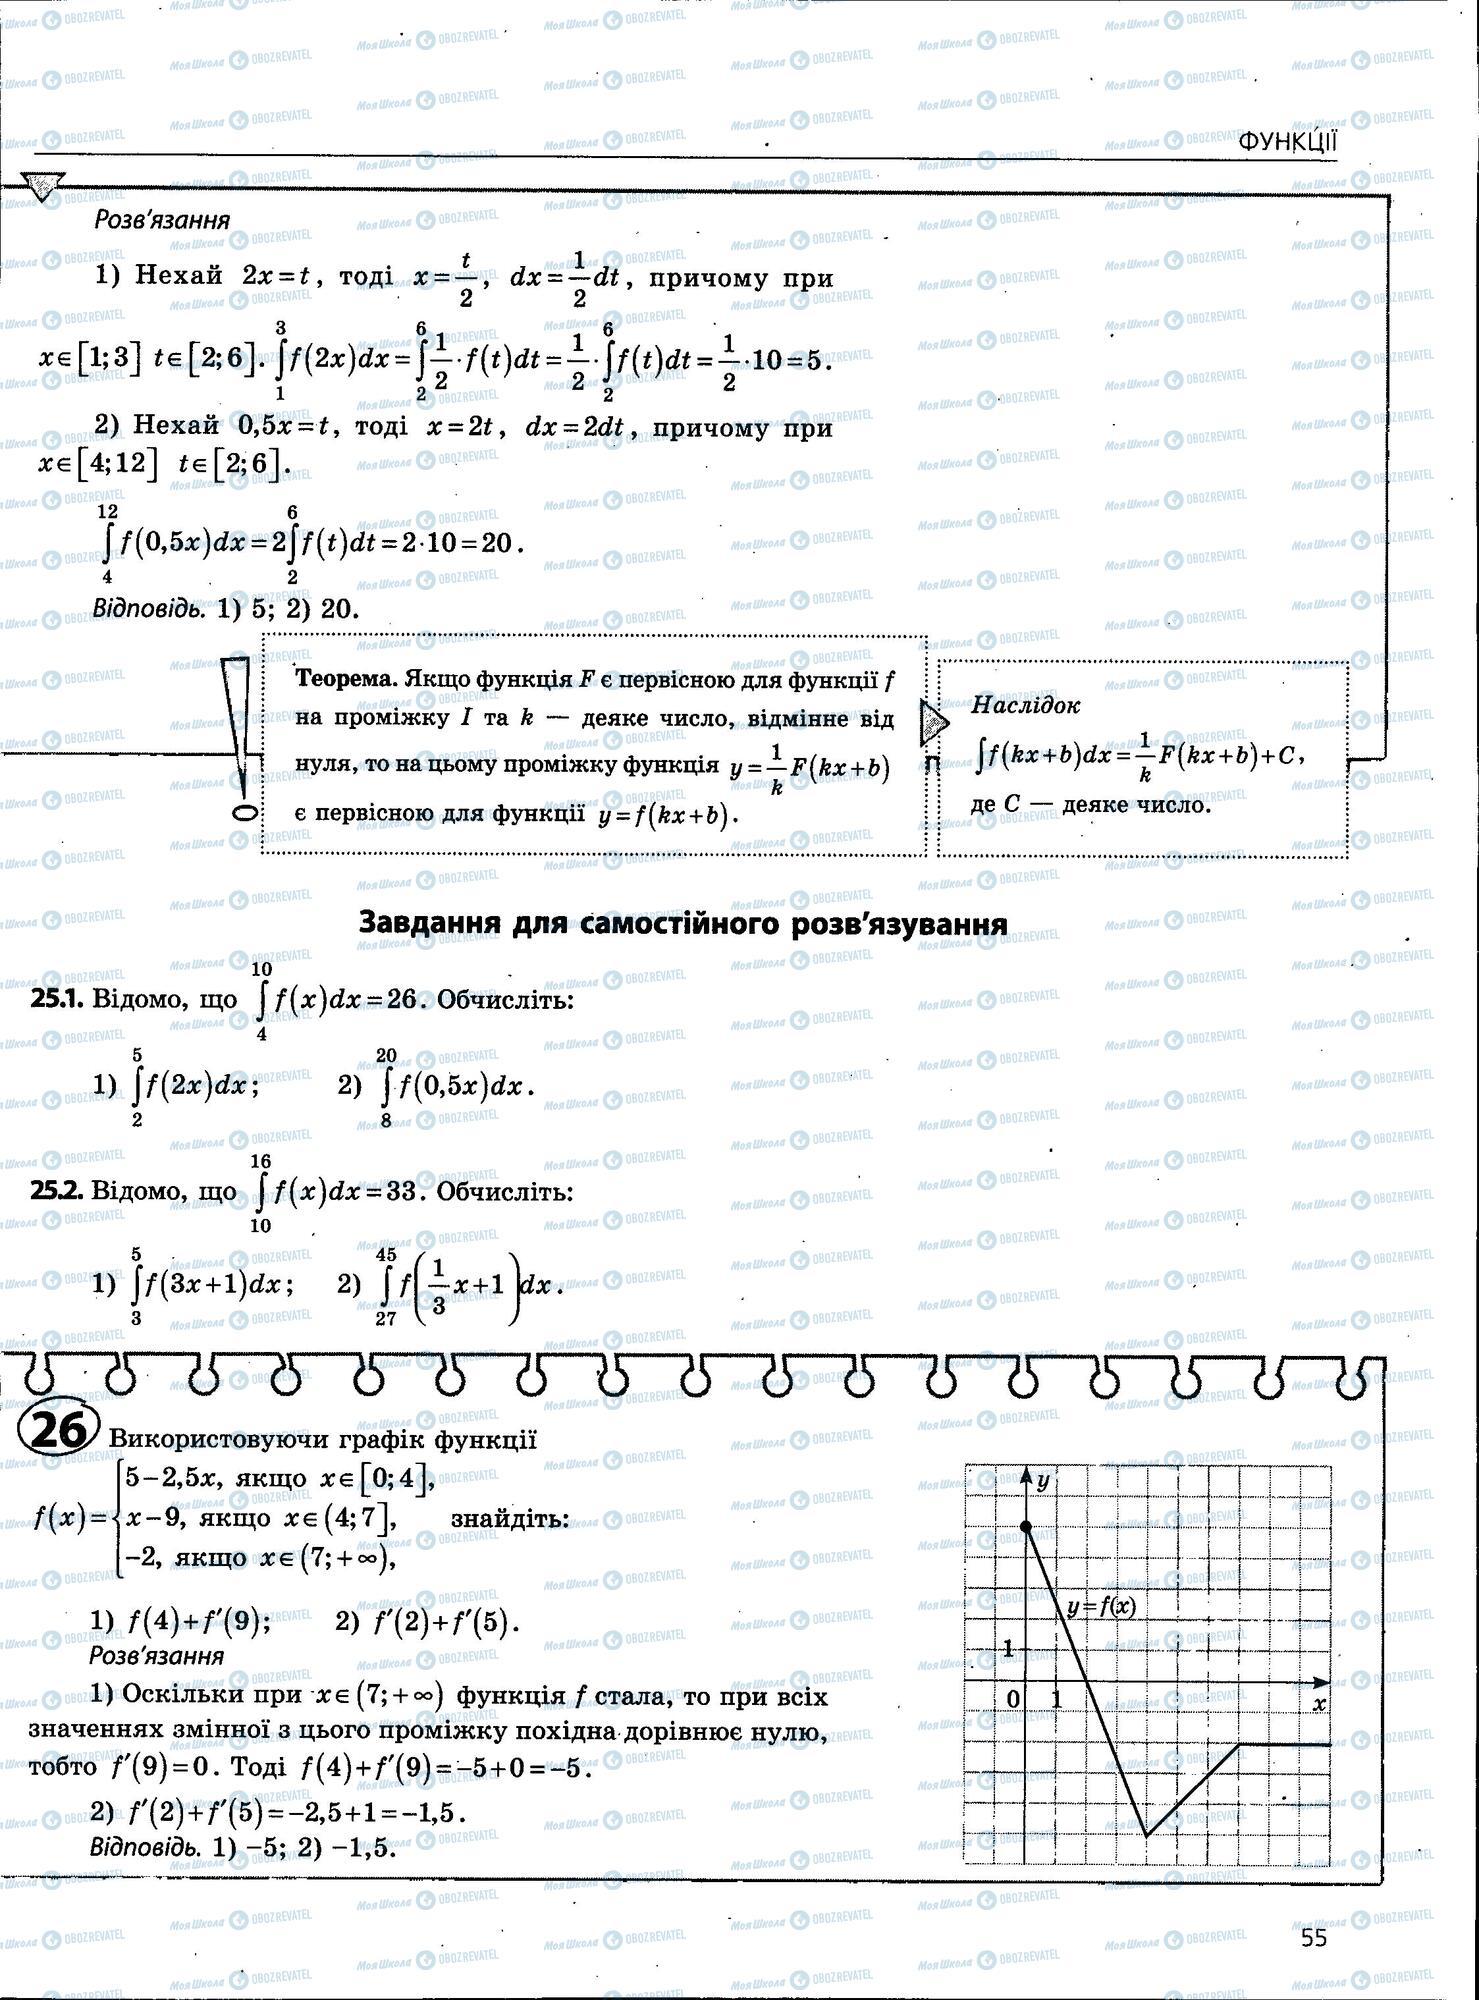 ЗНО Математика 11 класс страница 55